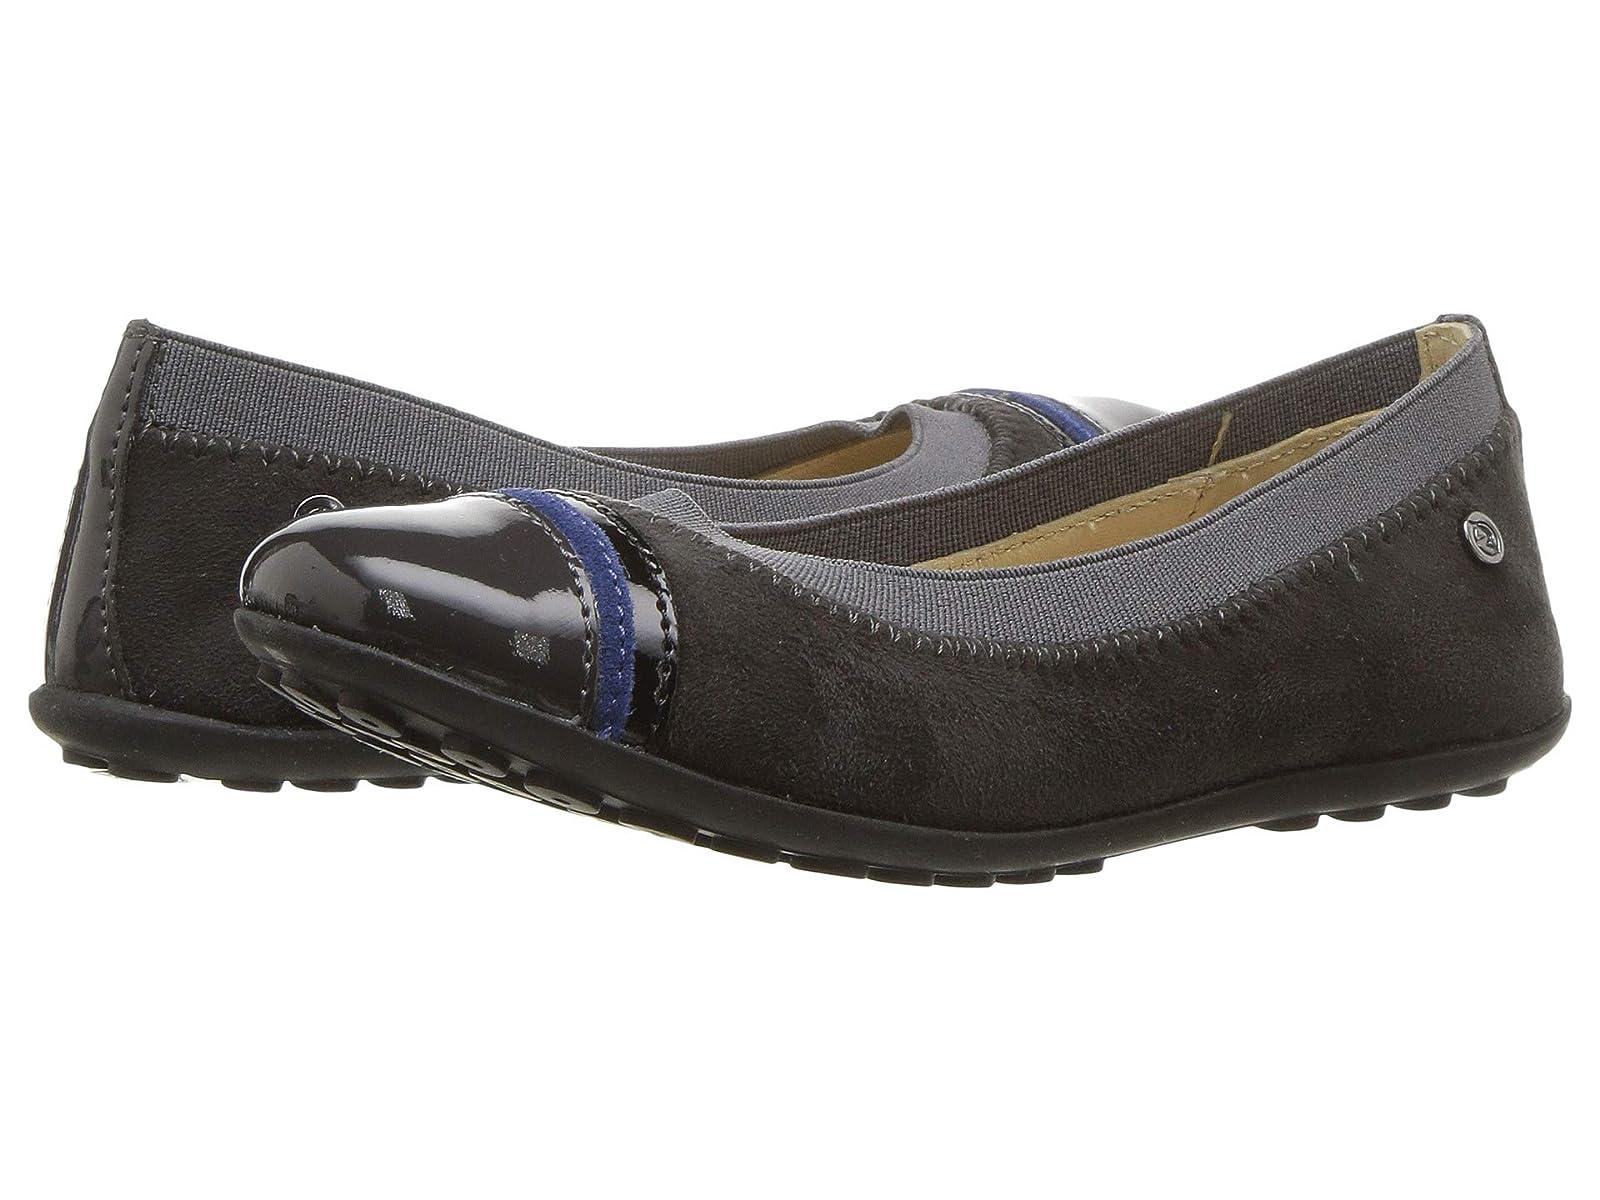 Naturino Venezia AW18 (Little Kid/Big Kid)Atmospheric grades have affordable shoes